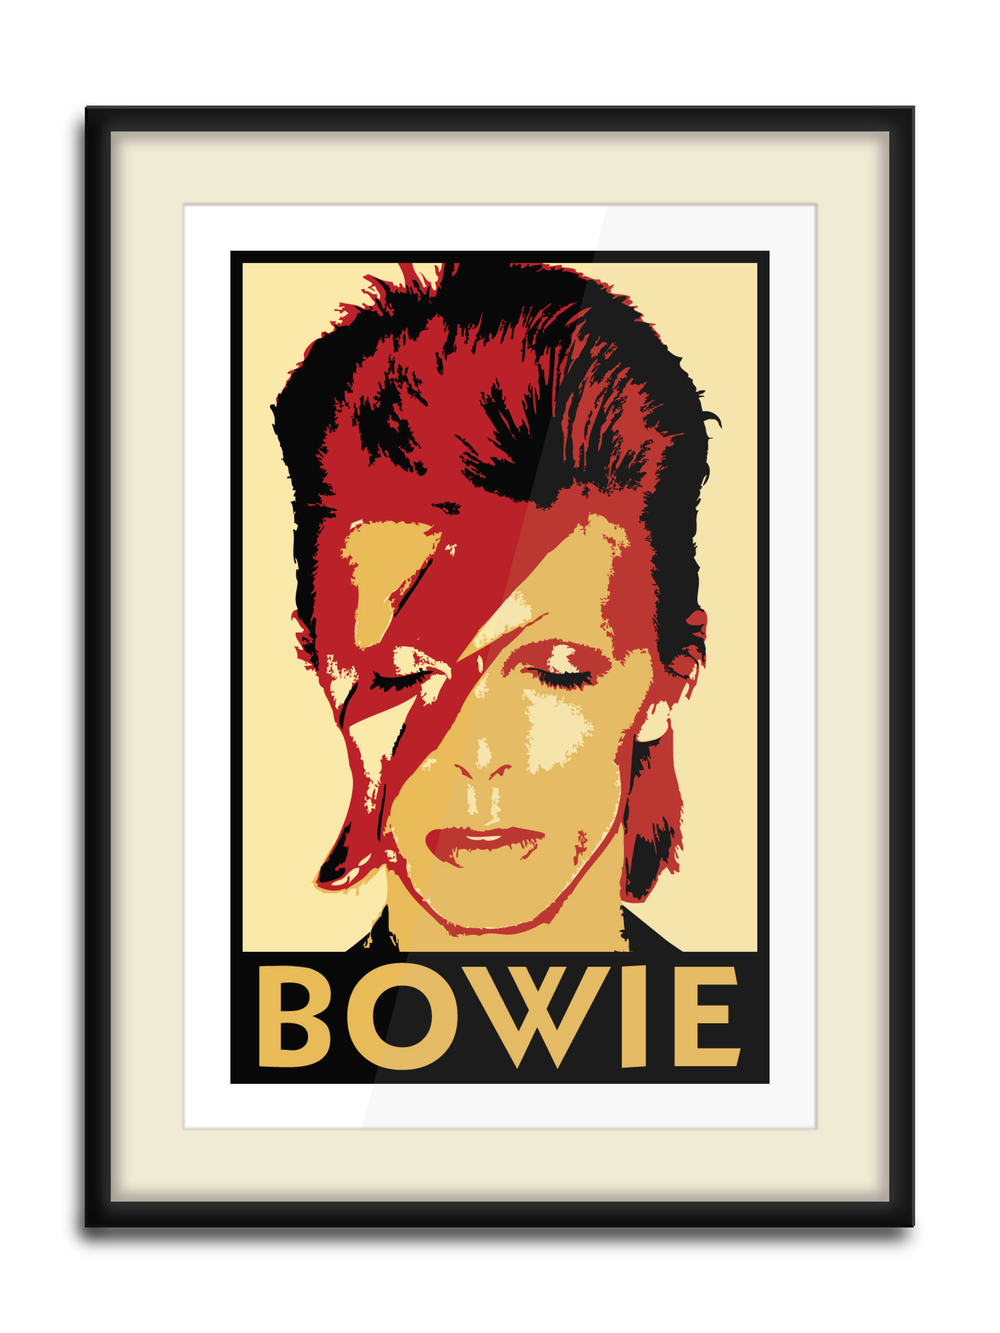 Bowie+Frame+Mockup-01.jpg